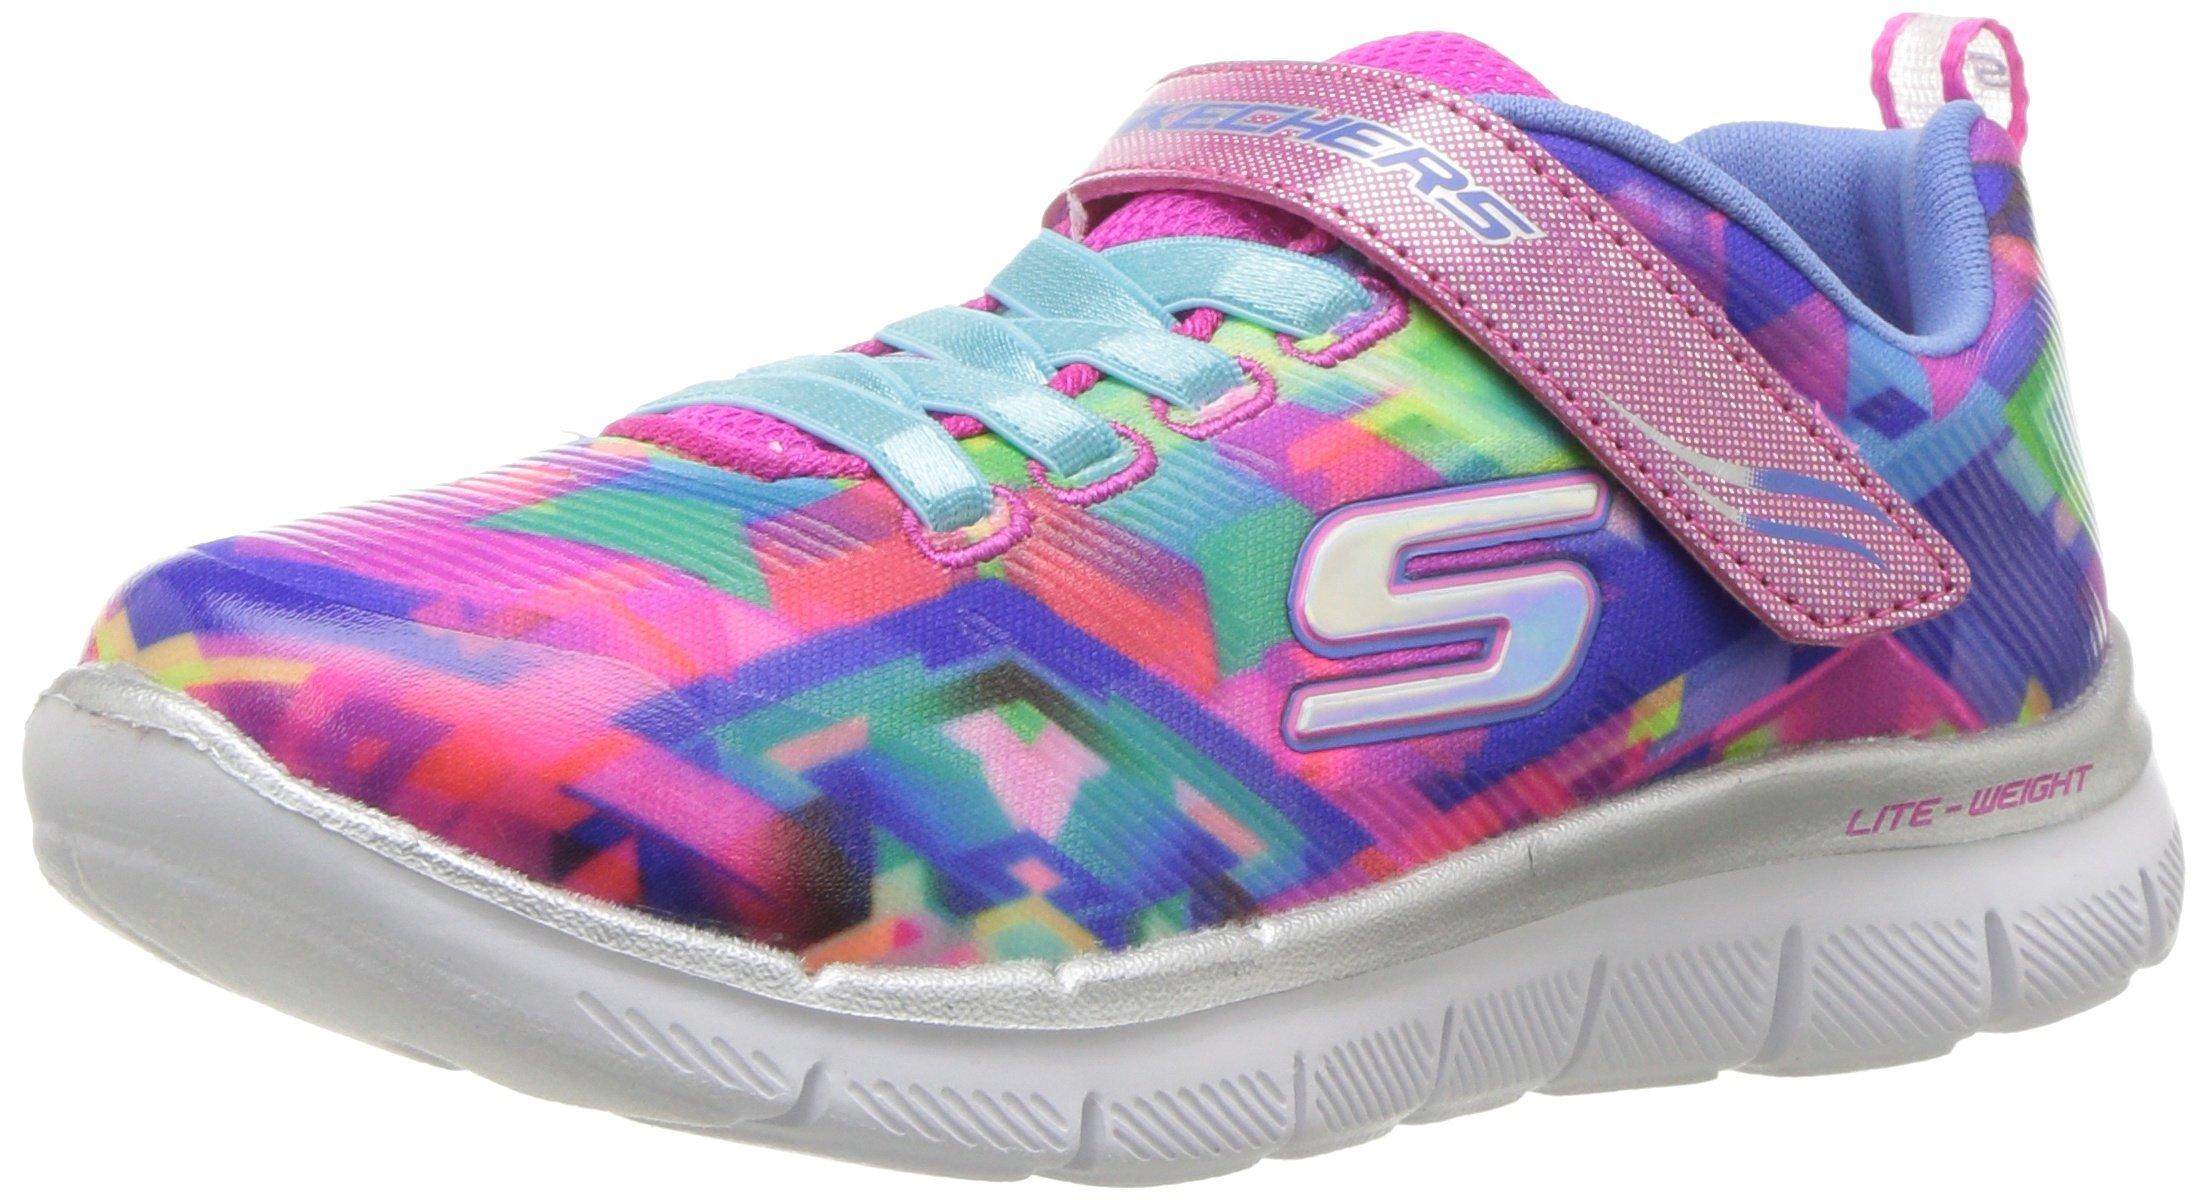 Skechers Kids Girls' Skech APPEAL2.0-Color ME Cute Sneaker, Blmt, 12 Medium US Little Kid